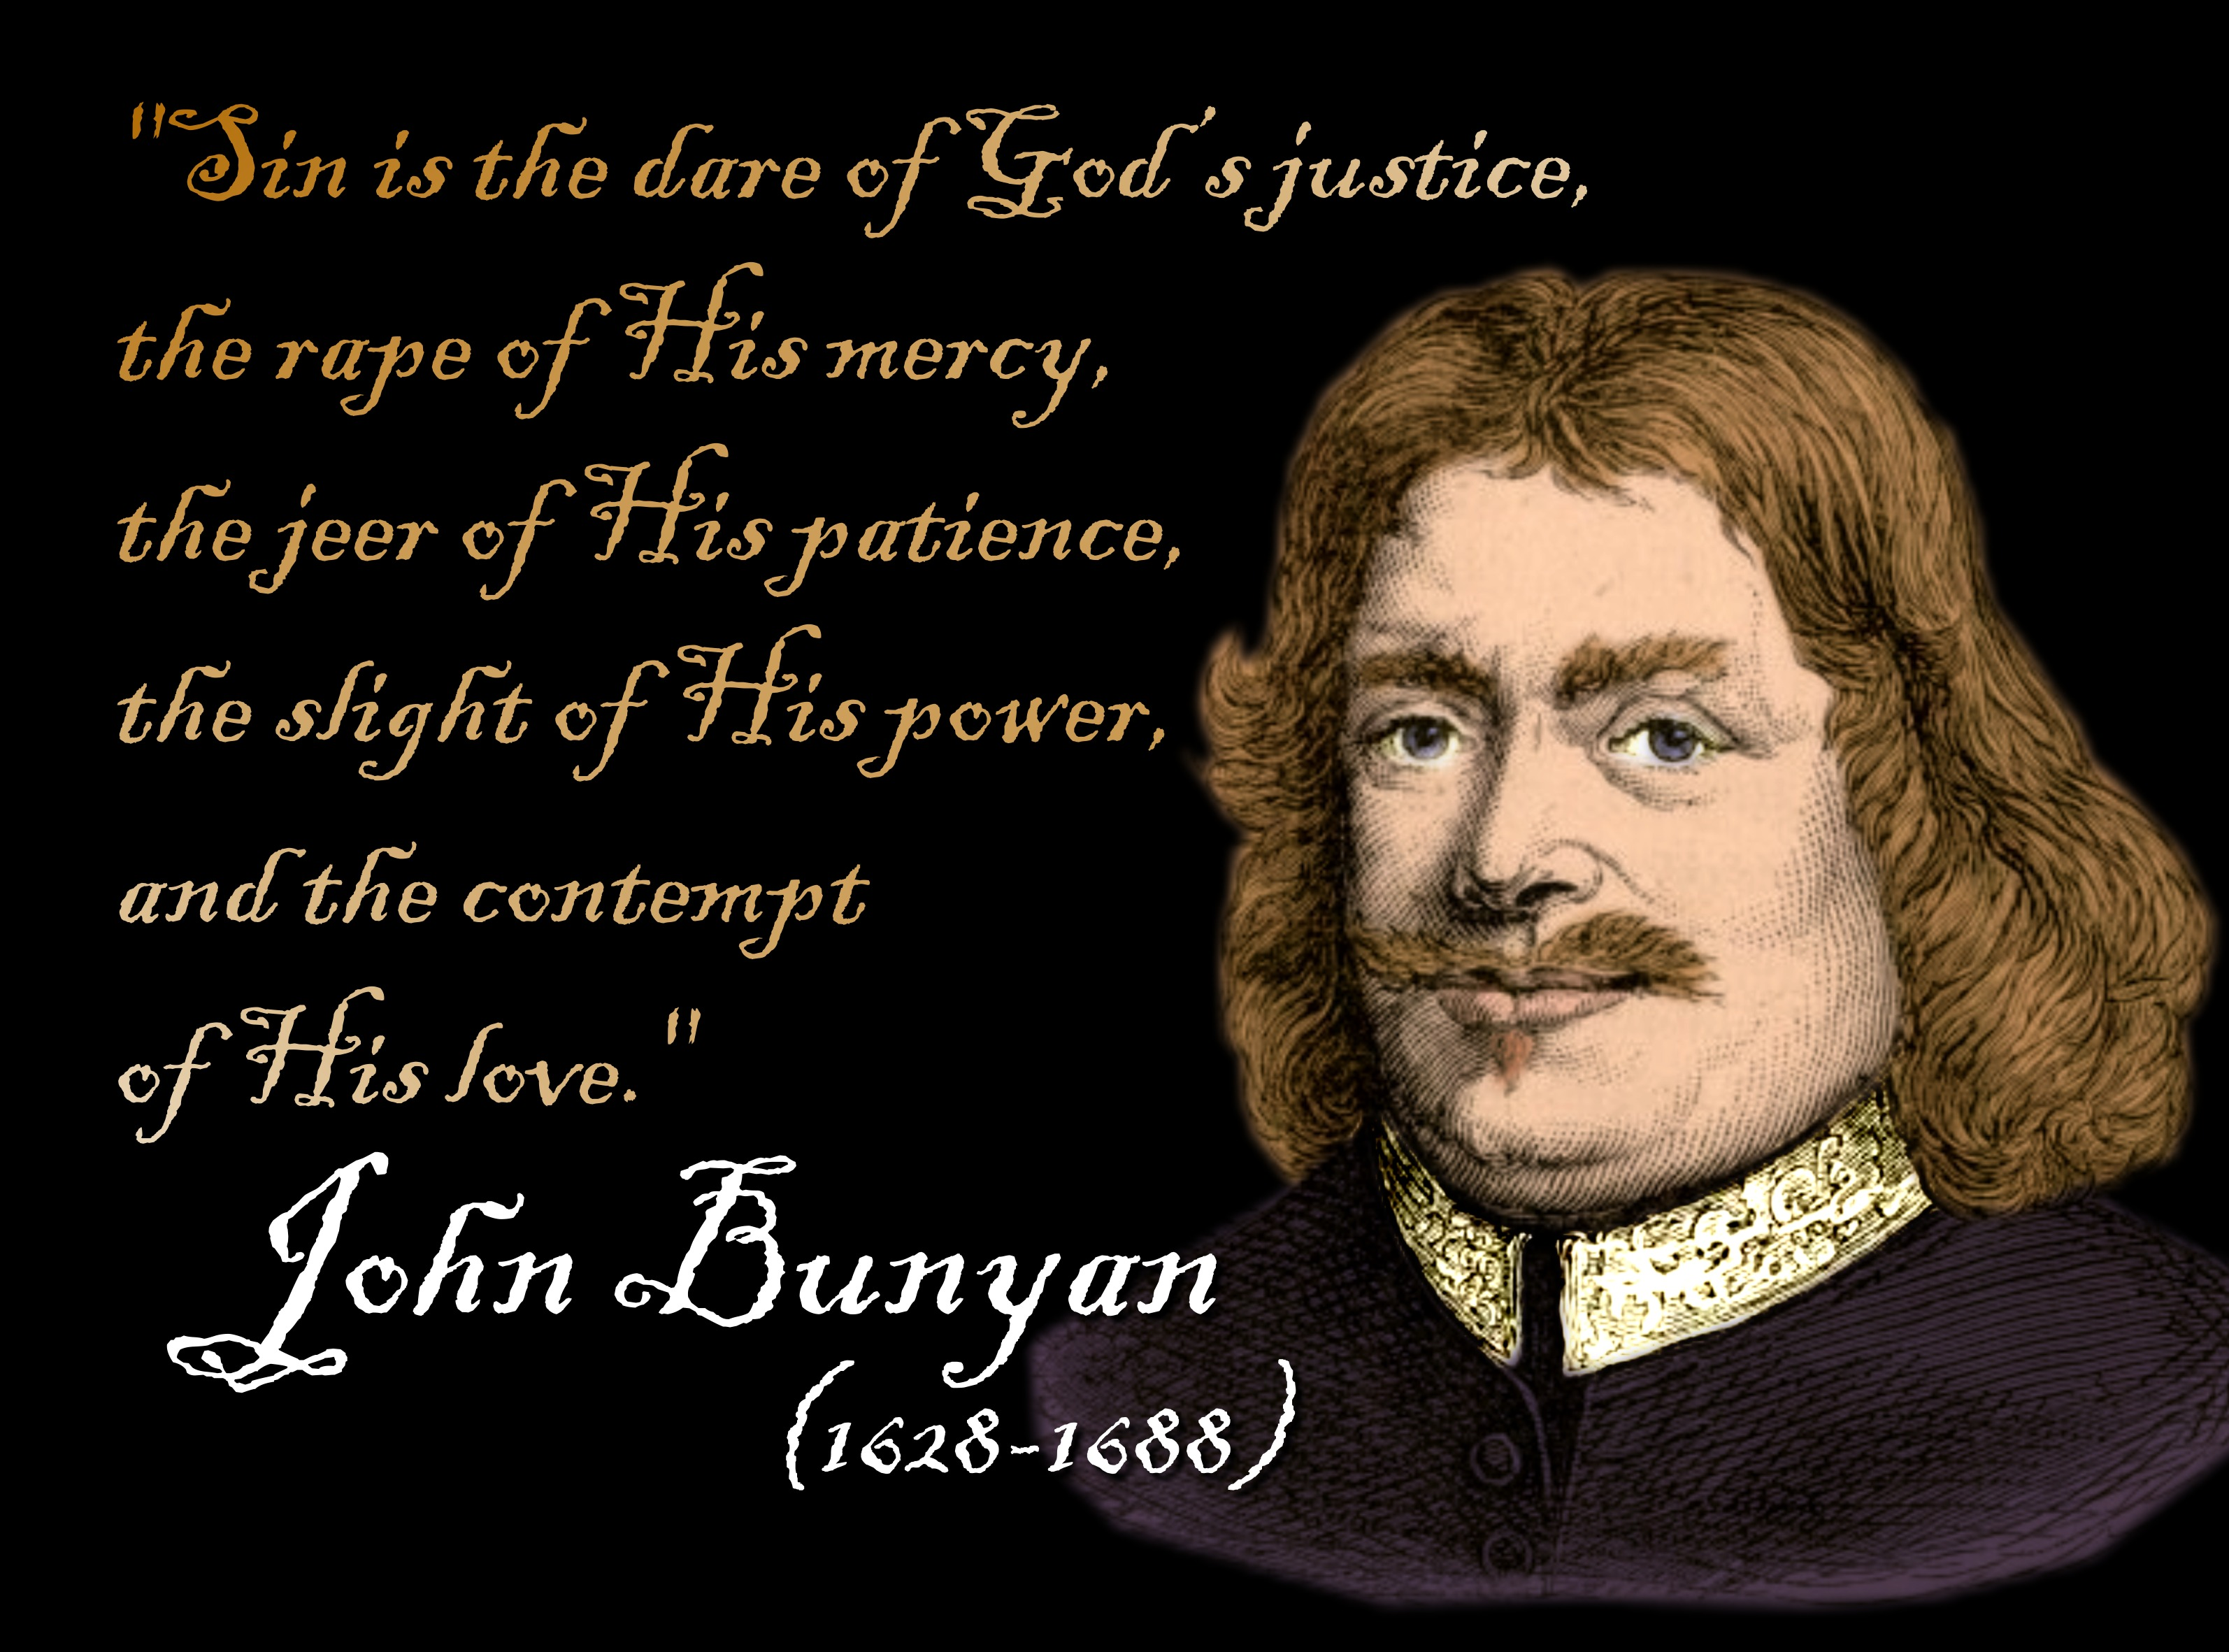 John Bunyan's quote #1